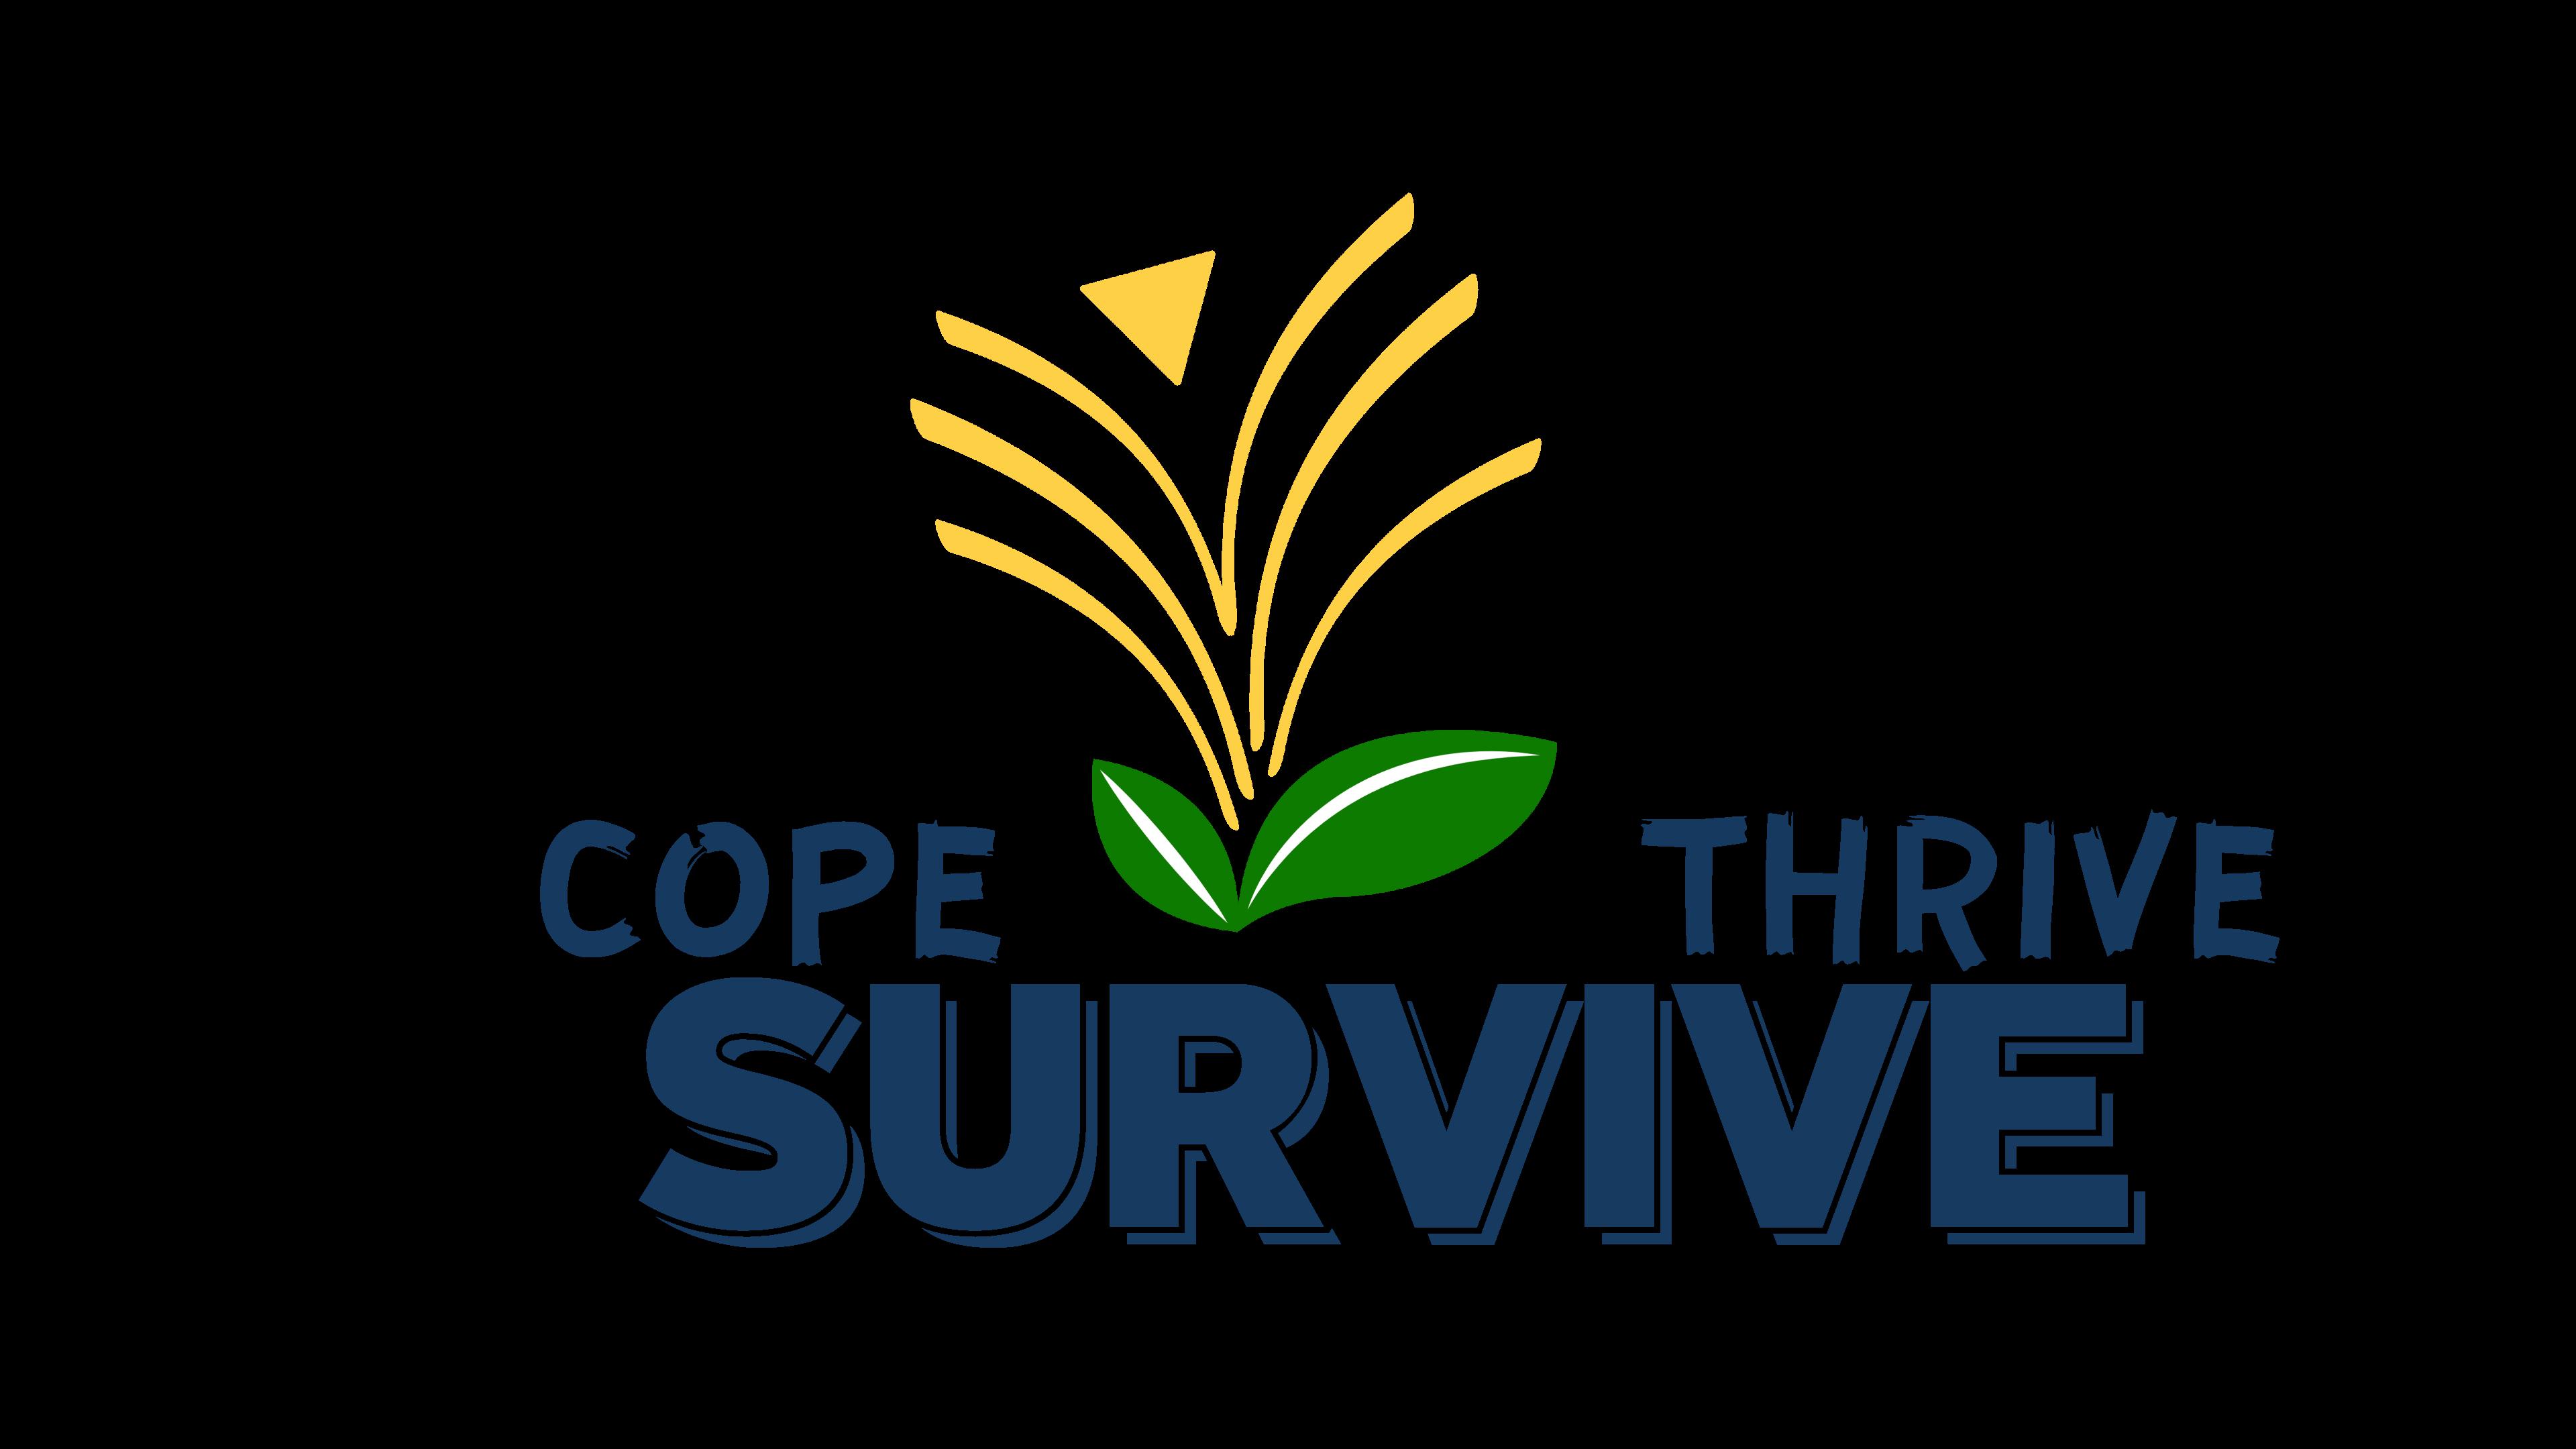 Cope Thrive Survive